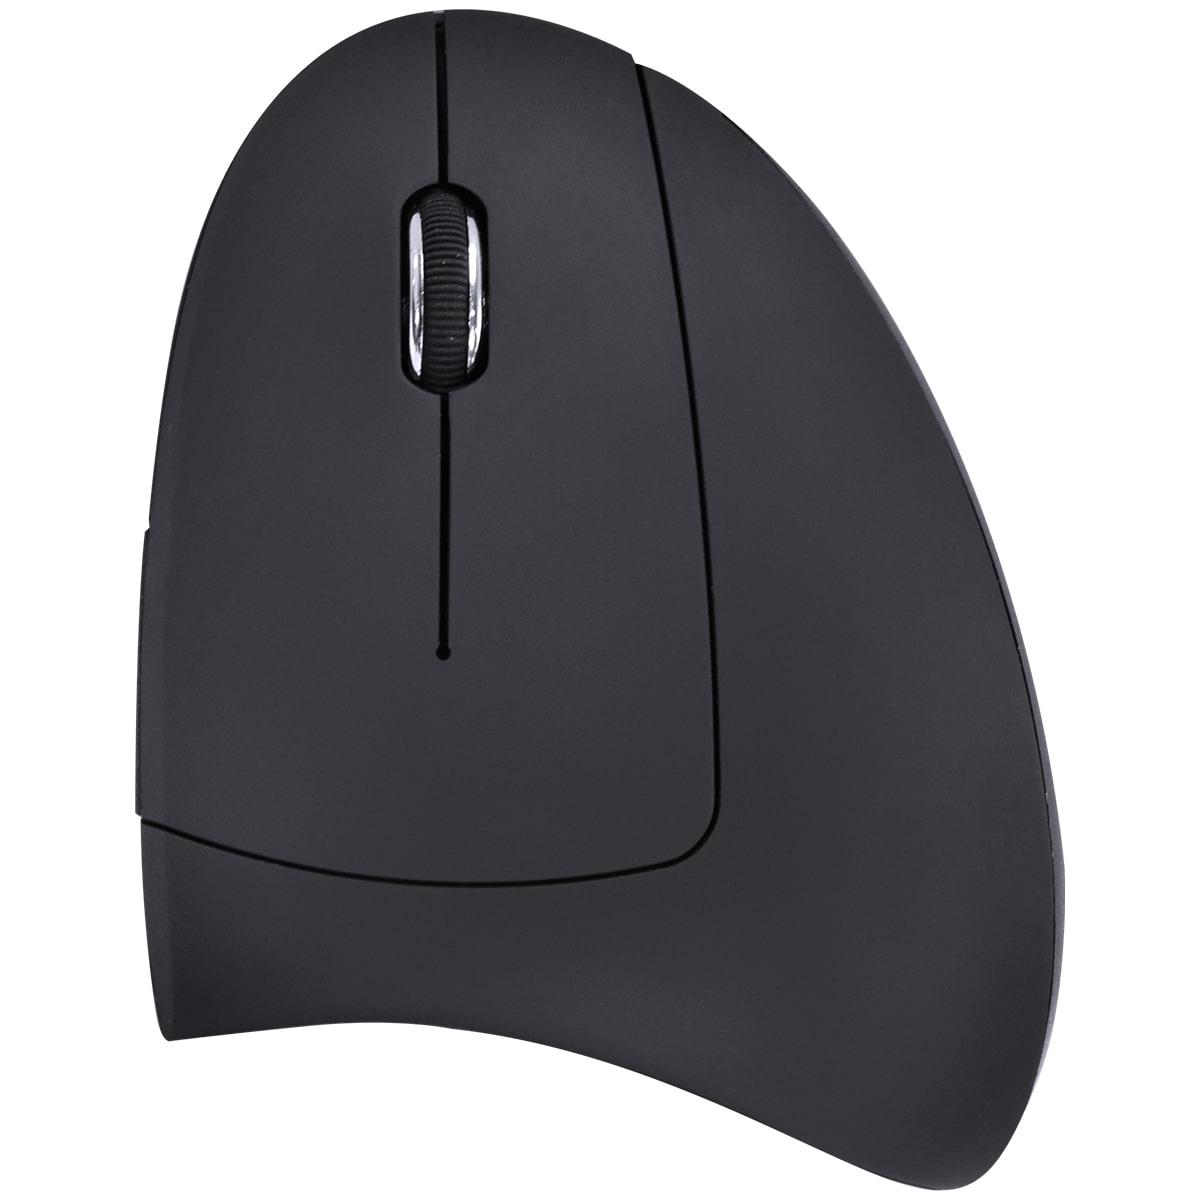 Mouse Vinik sem Fio, Vertical, Ergonômico, Ortopédico, Recarregável, 2.4GHz, Power Fit, 1600DPI, Preto, USB - PM300